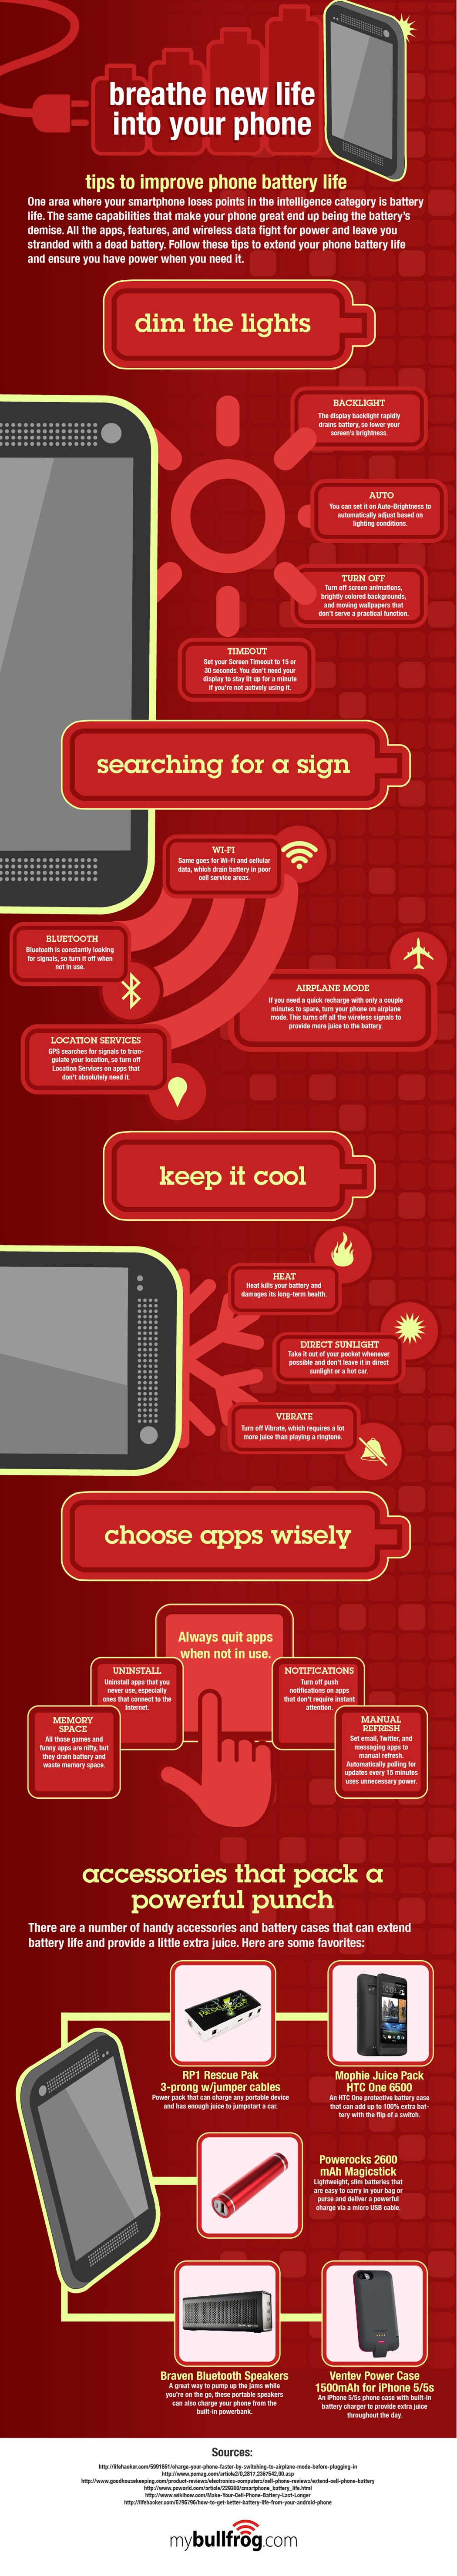 improve phone battery life